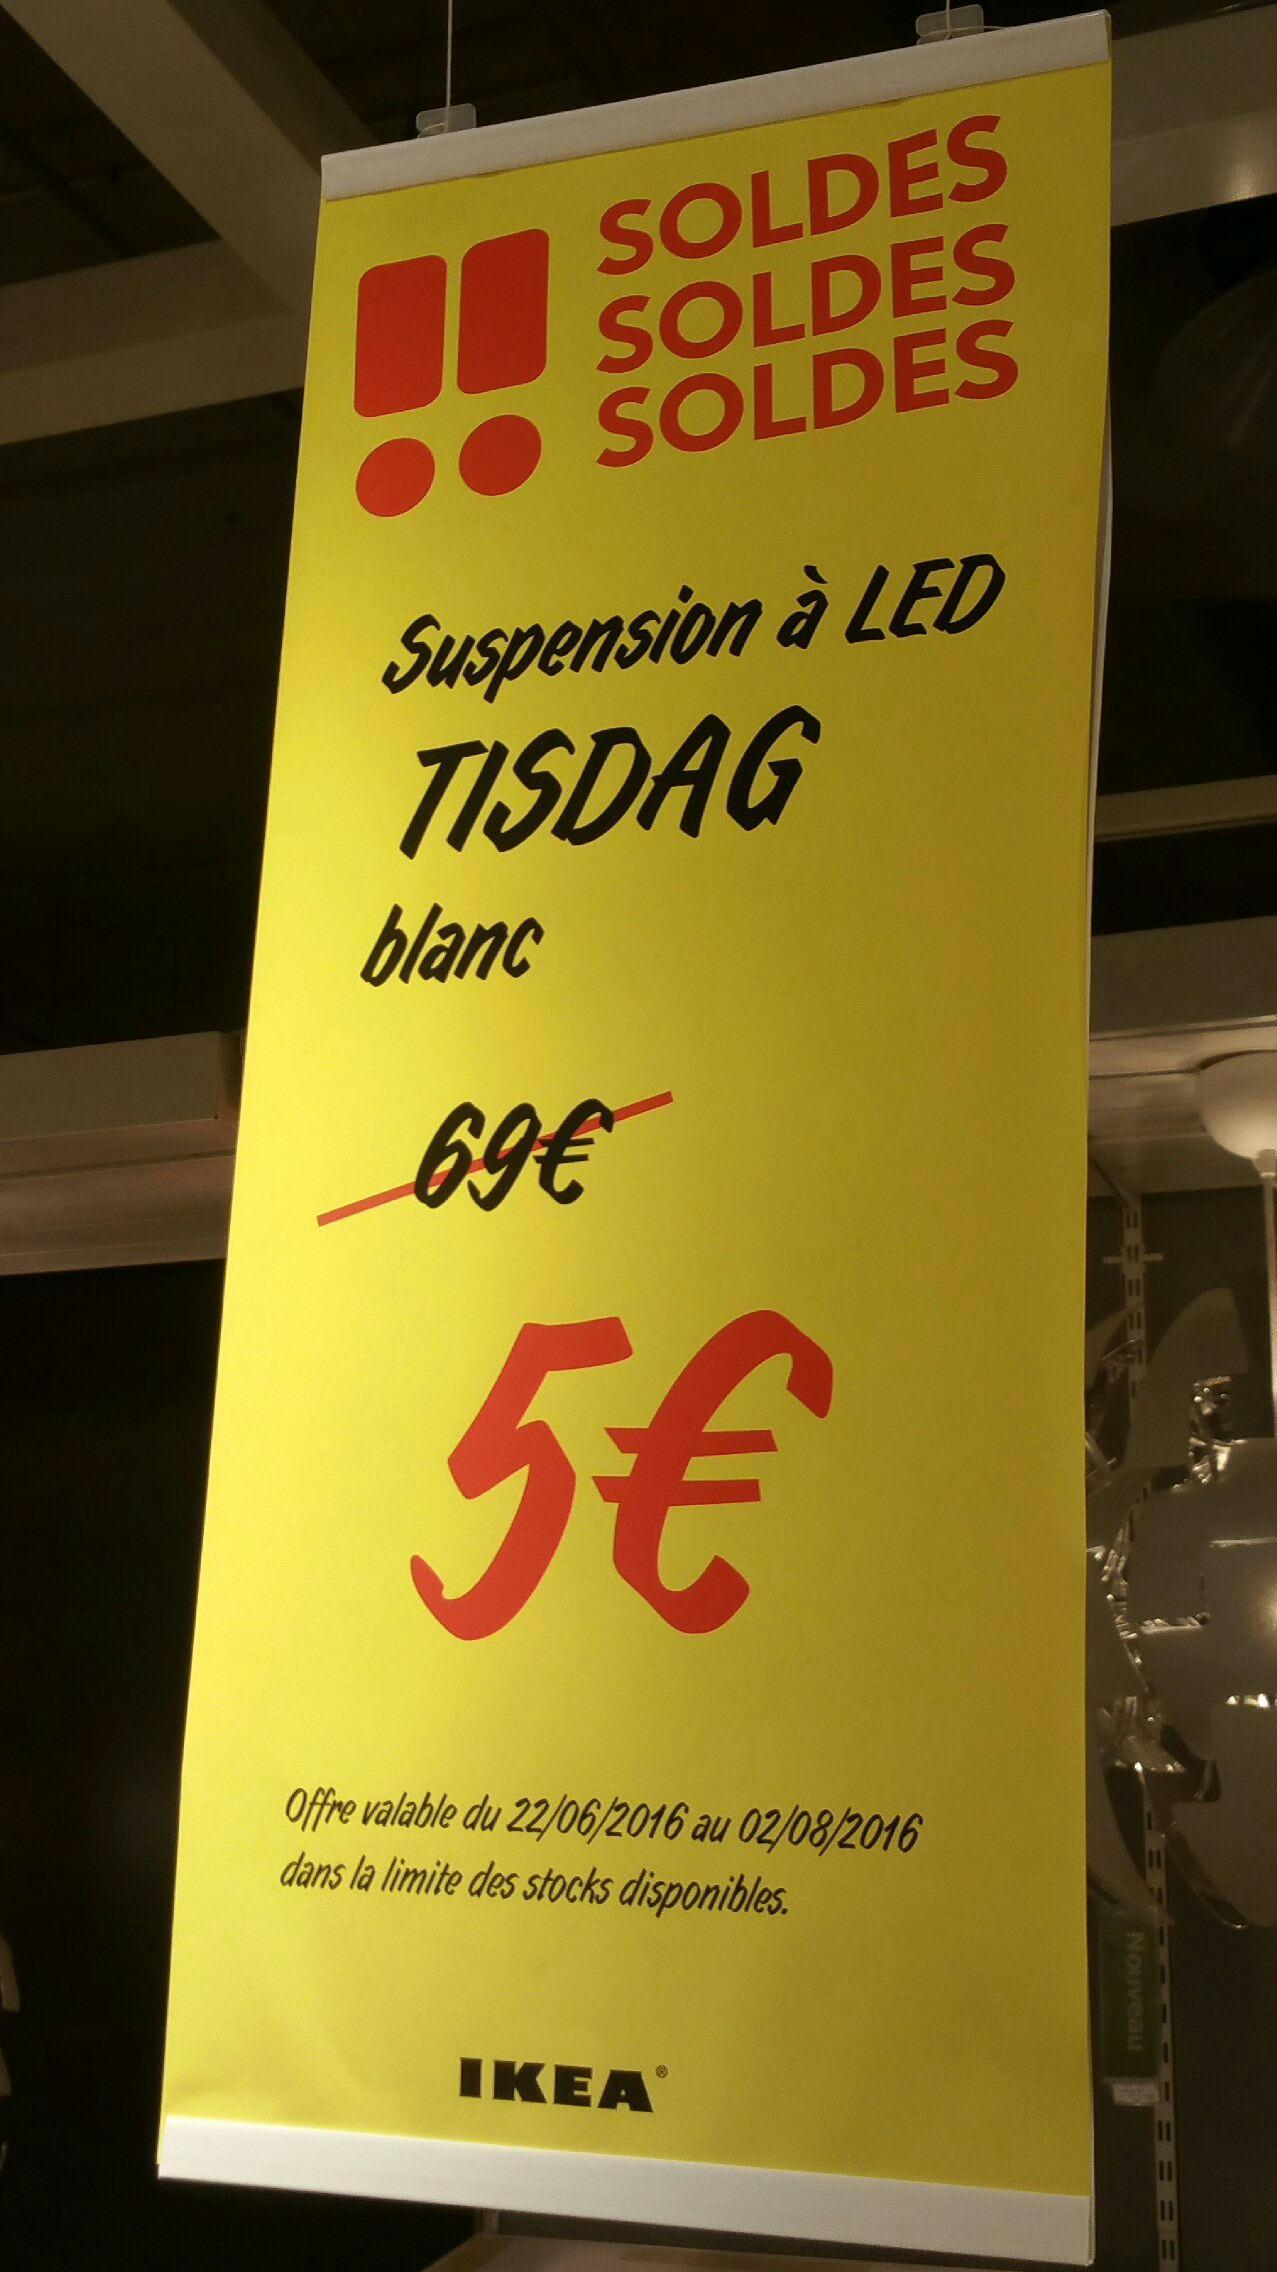 Suspension à LED Tisdag - Blanc